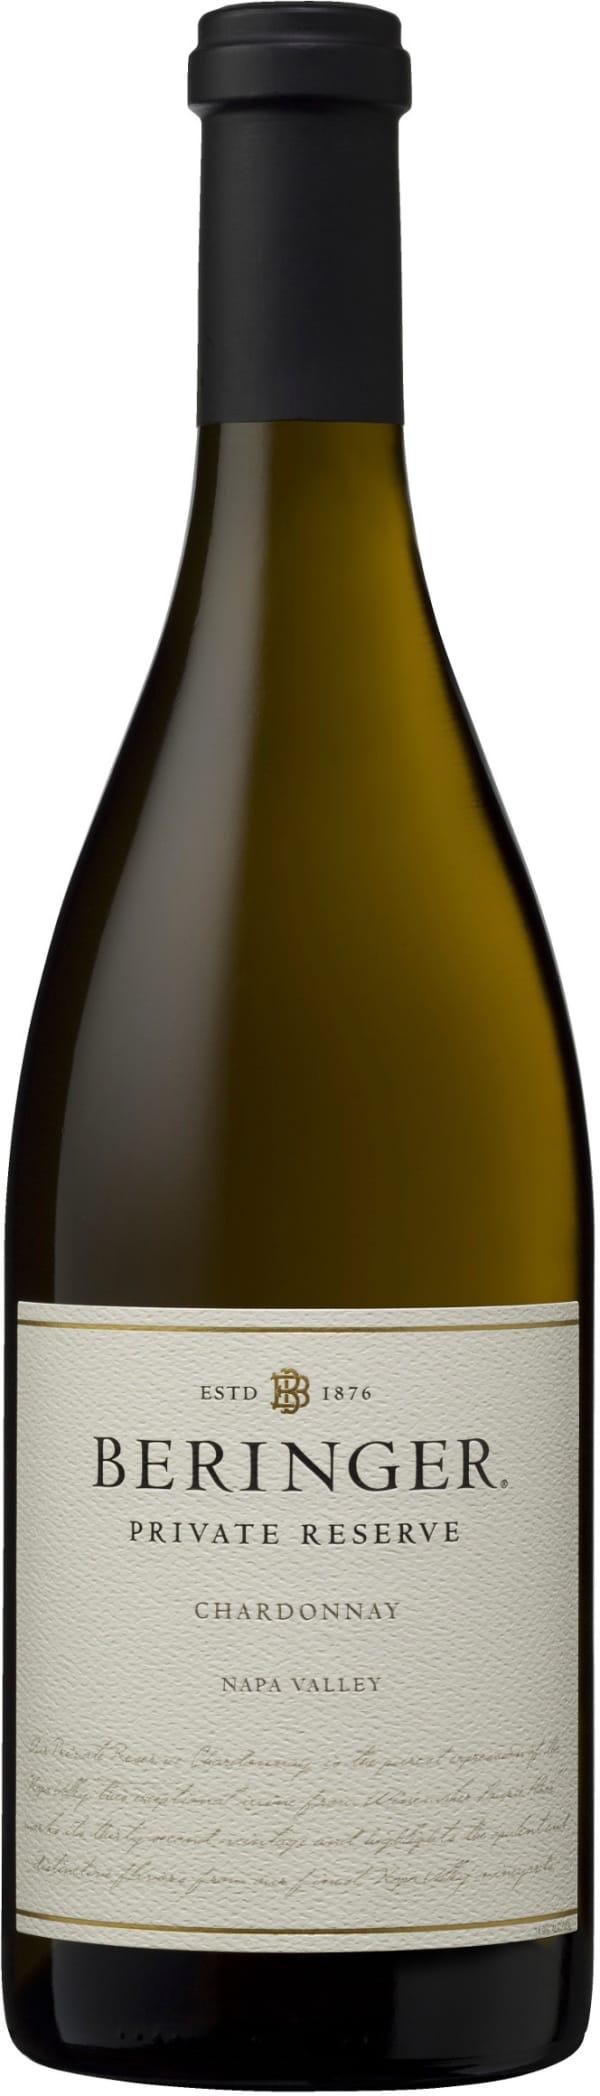 Beringer Private Reserve Chardonnay 2016